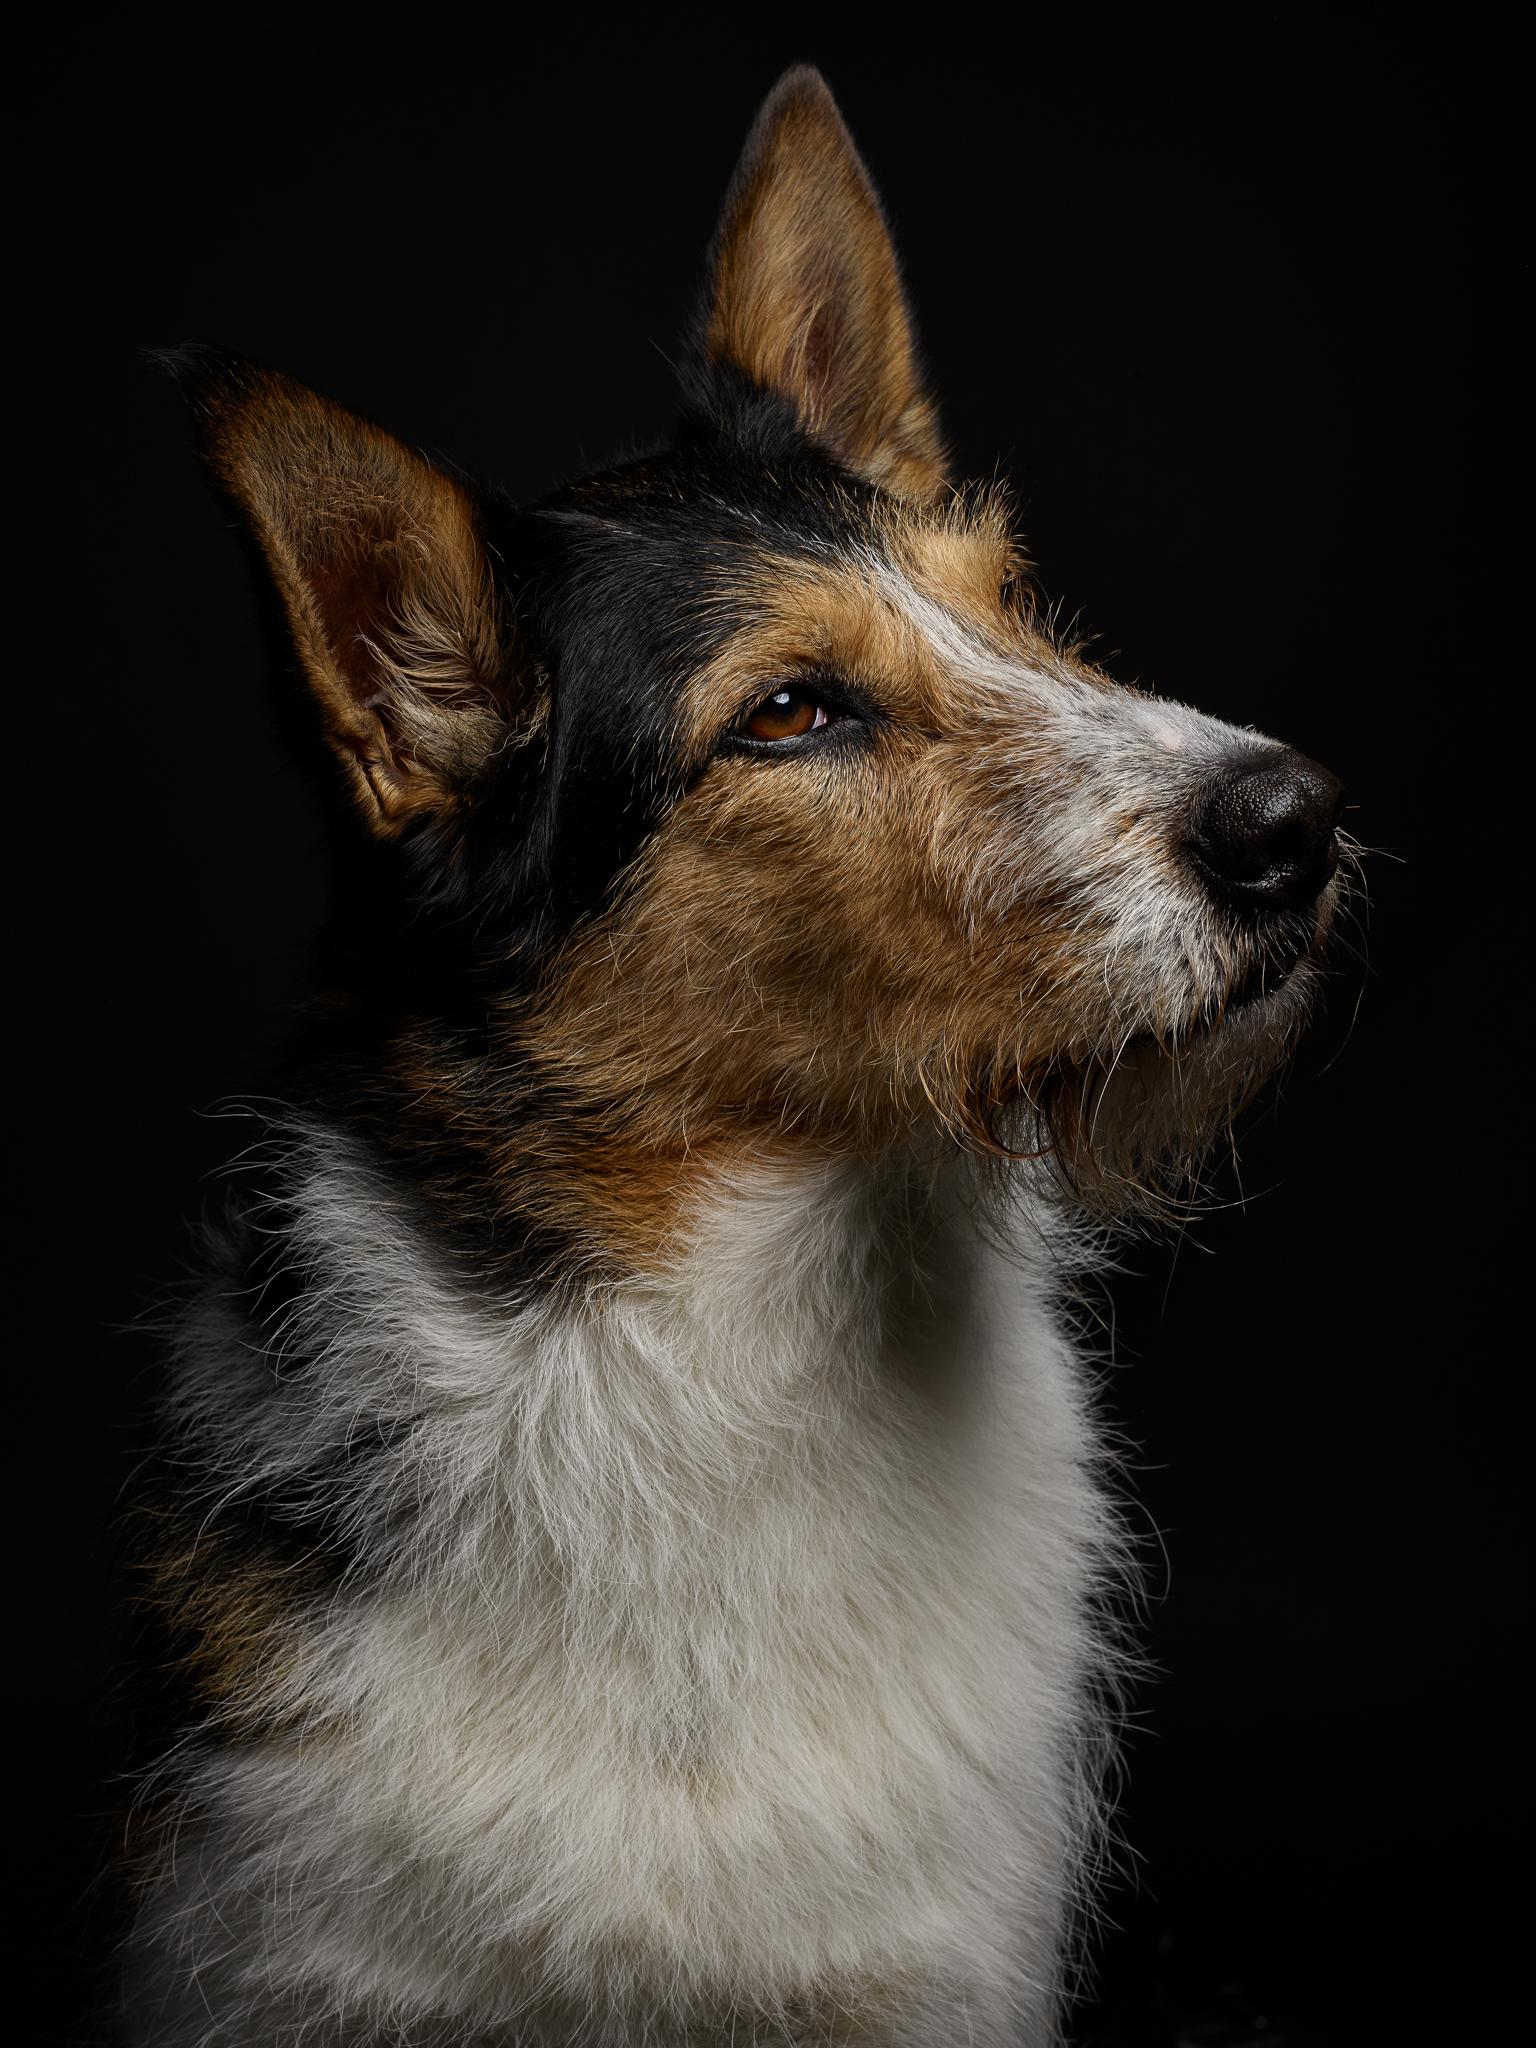 klaus-dyba-dog-photography-